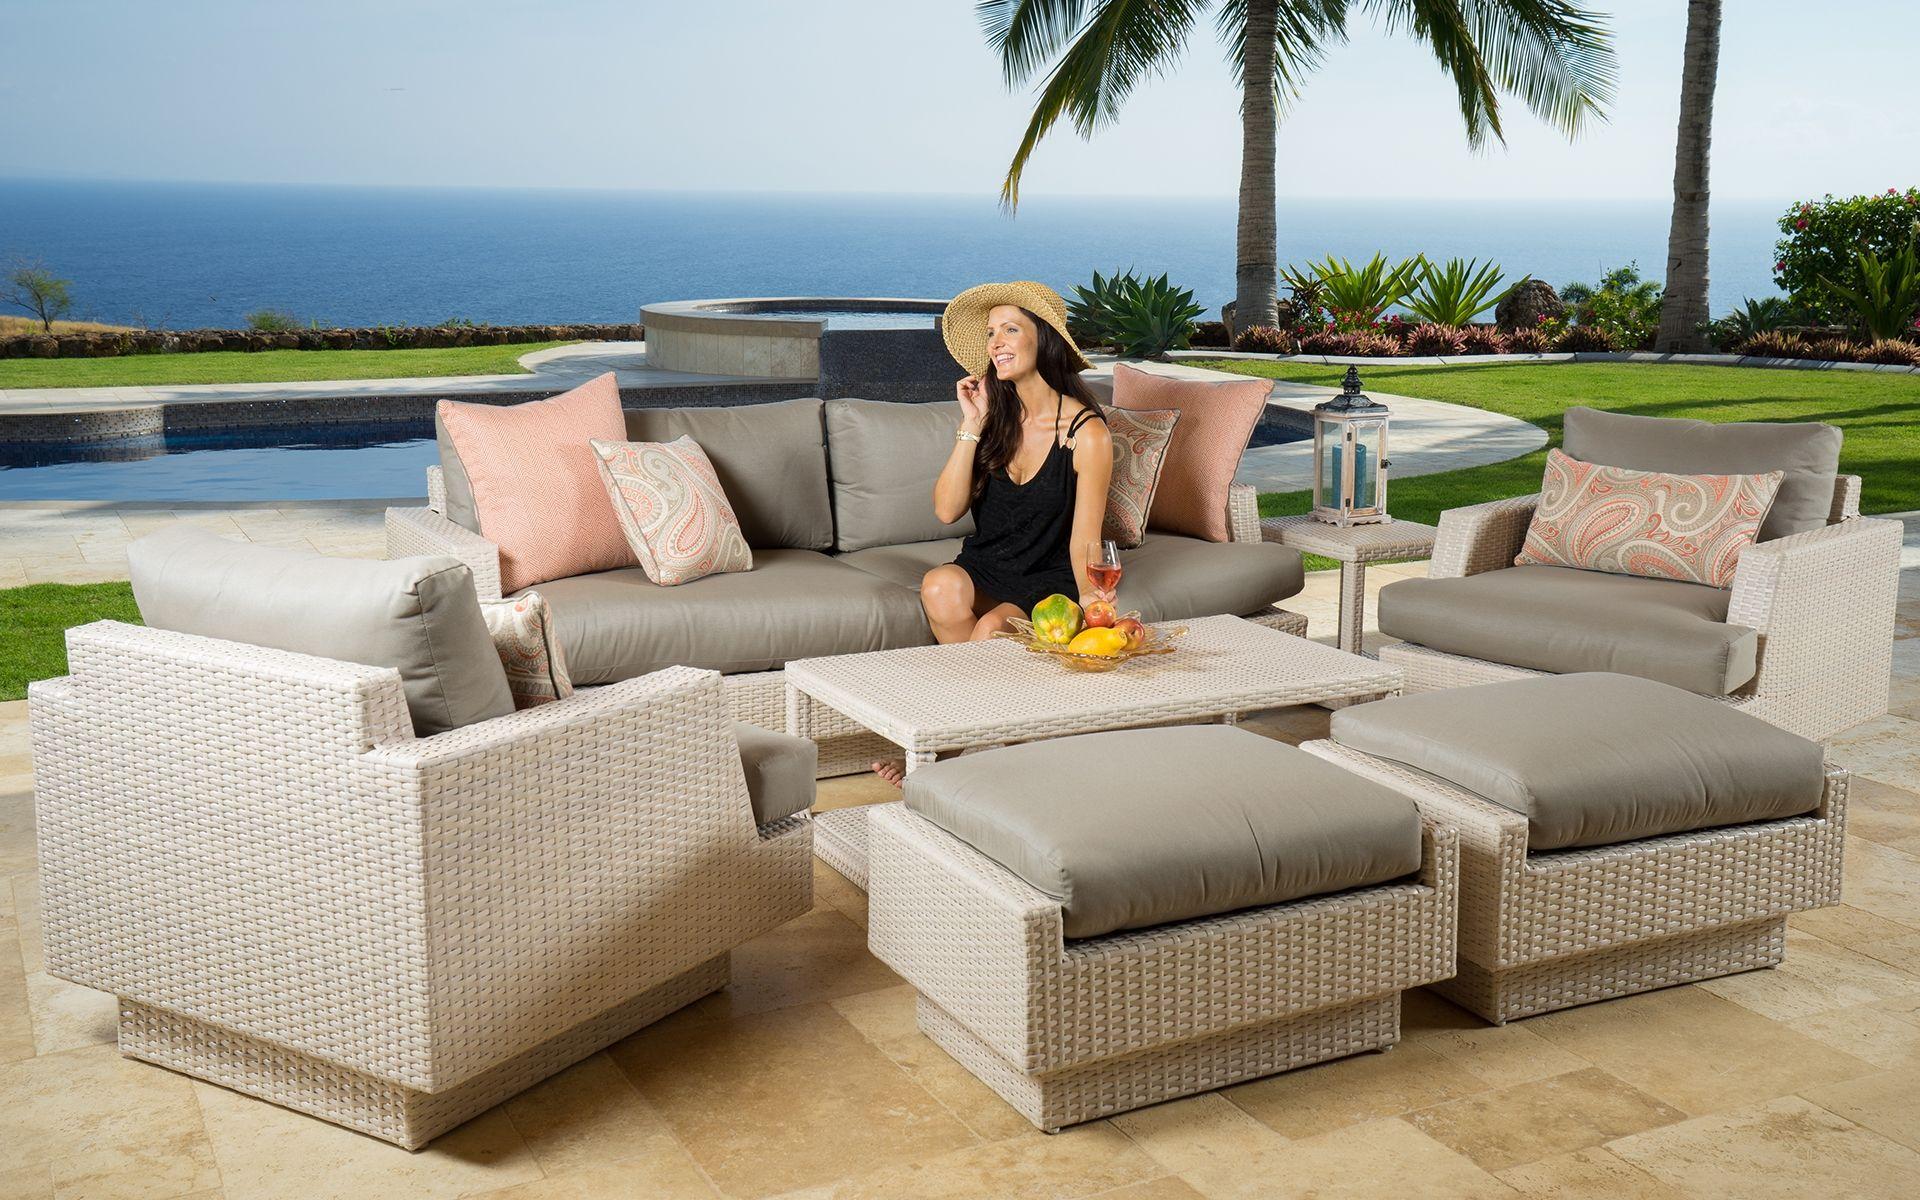 Awesome Portofino Patio Furniture Home The Outdoor Furniture Outlet Portofino Patio Furniture Luxury Patio Furniture Outdoor Furniture